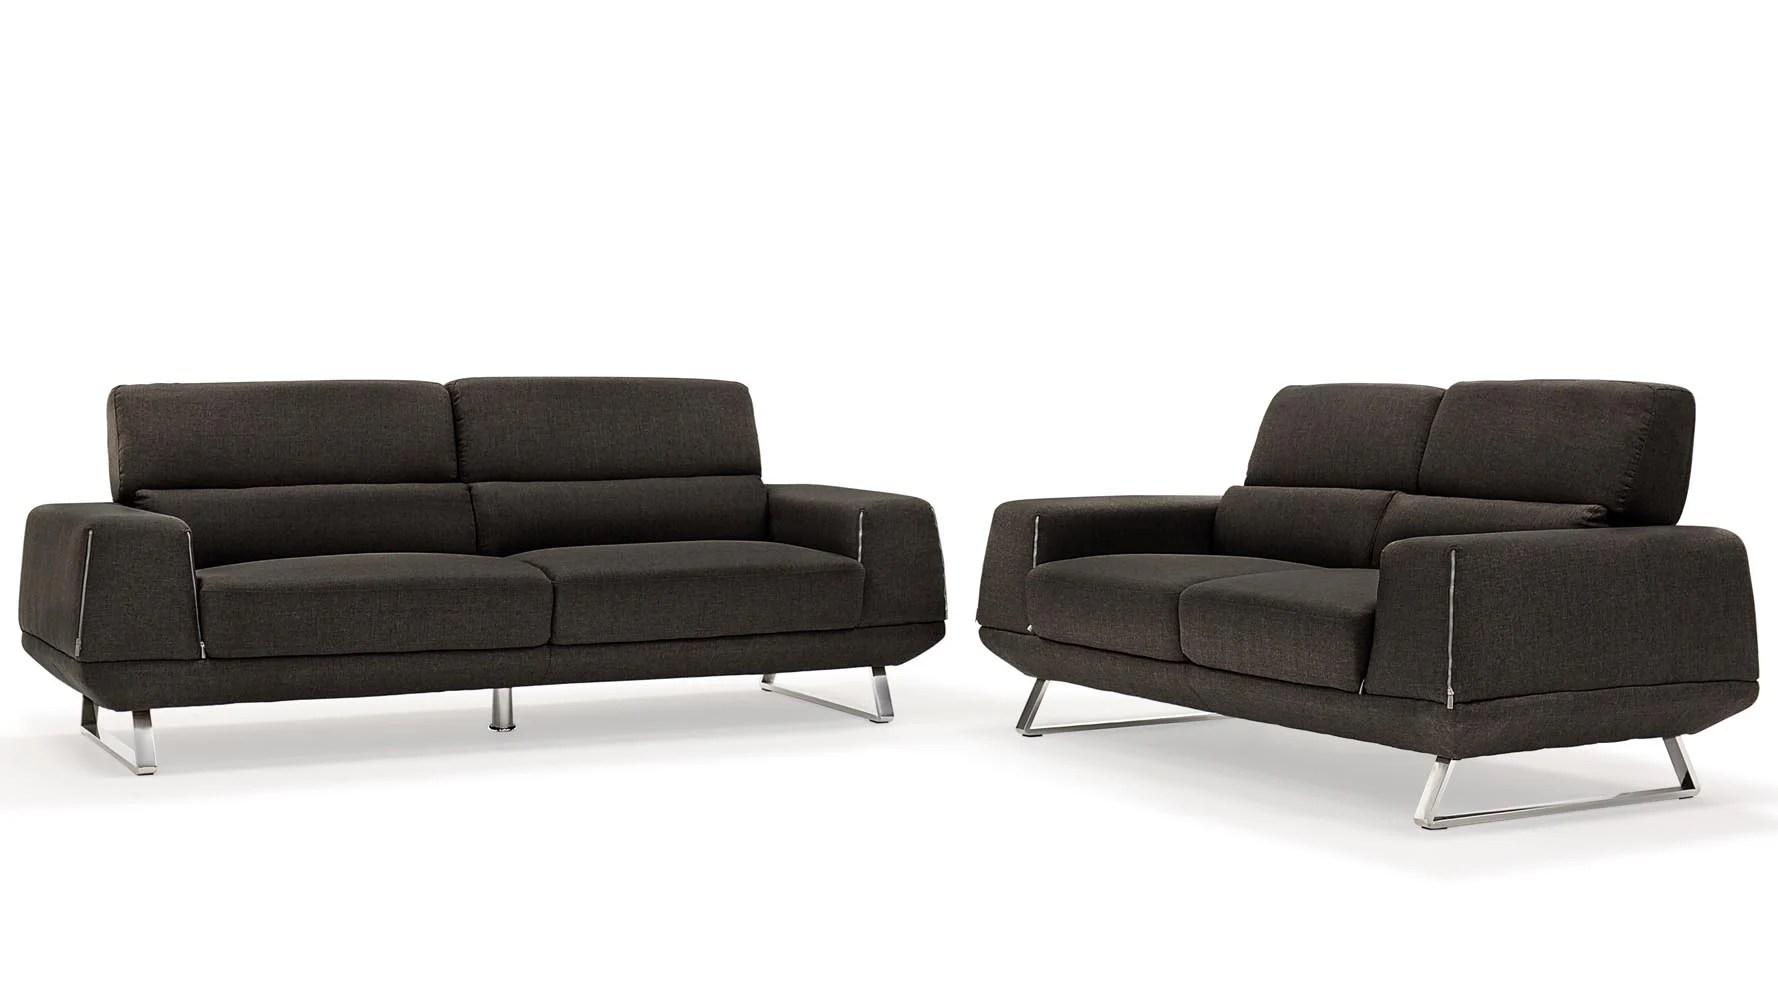 plush zara sofa review colorful pillows for dfs home co